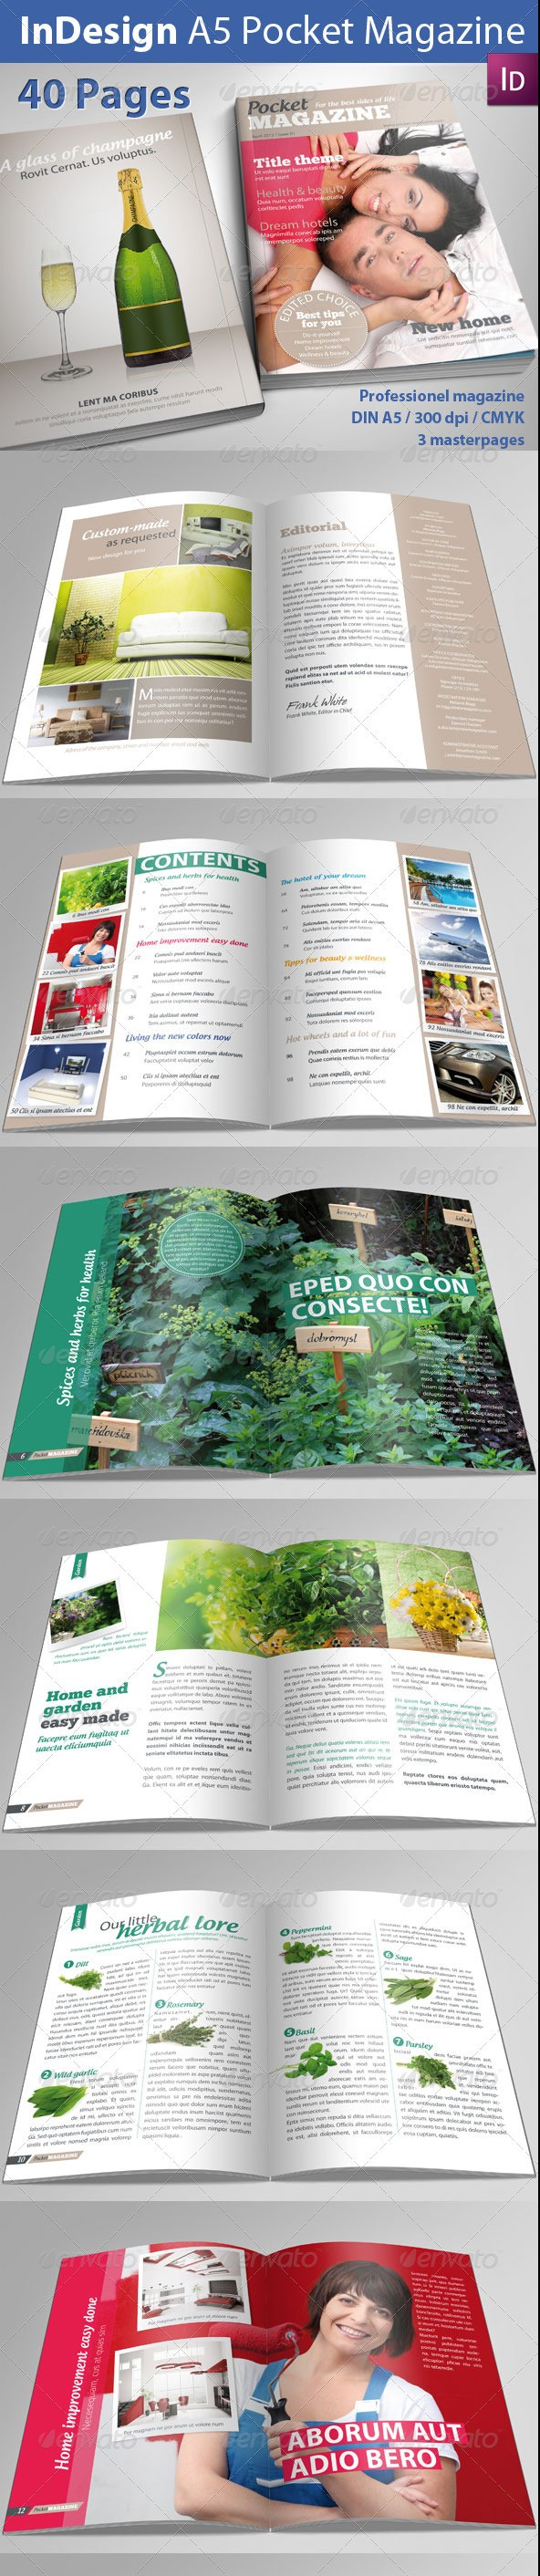 A5 Pocket Magazine